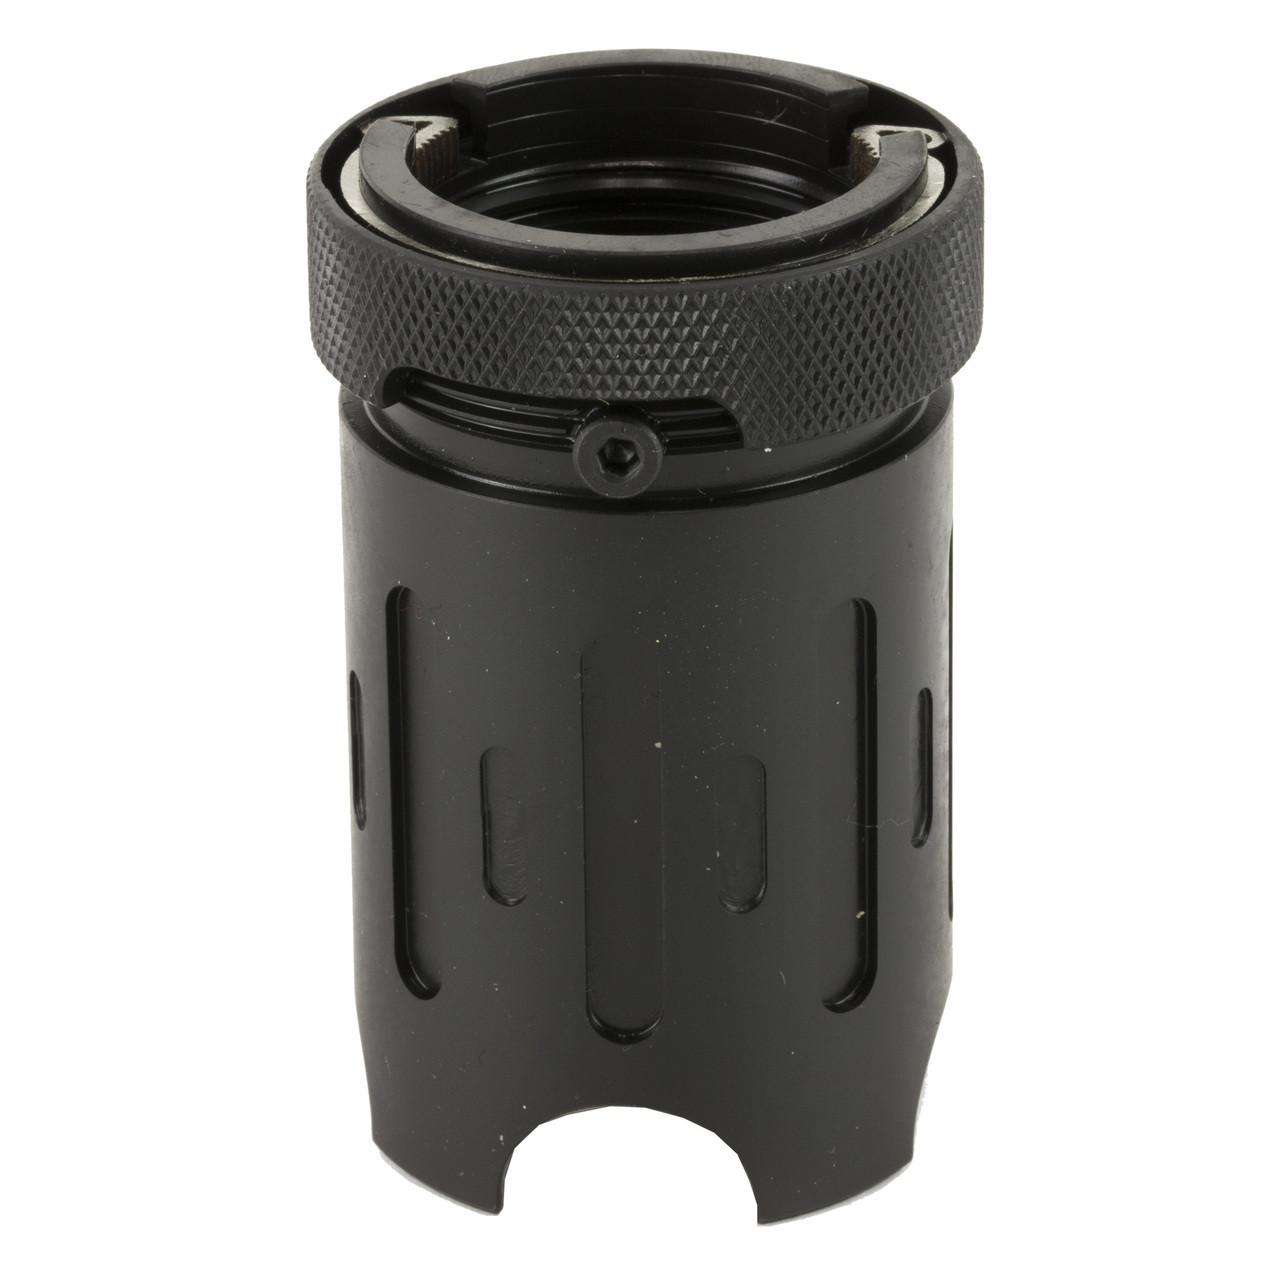 SilencerCo ASR Blast Shield, Black Finish AC1548, UPC :817272016956